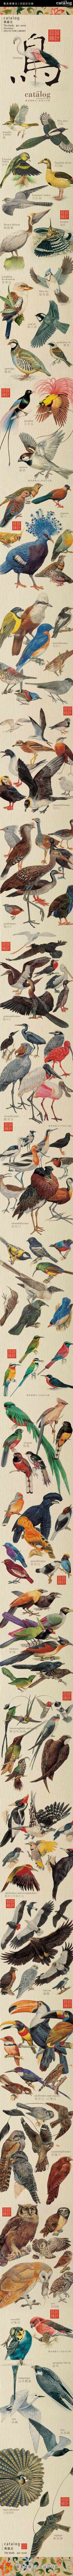 birds-beautiful-illustrations